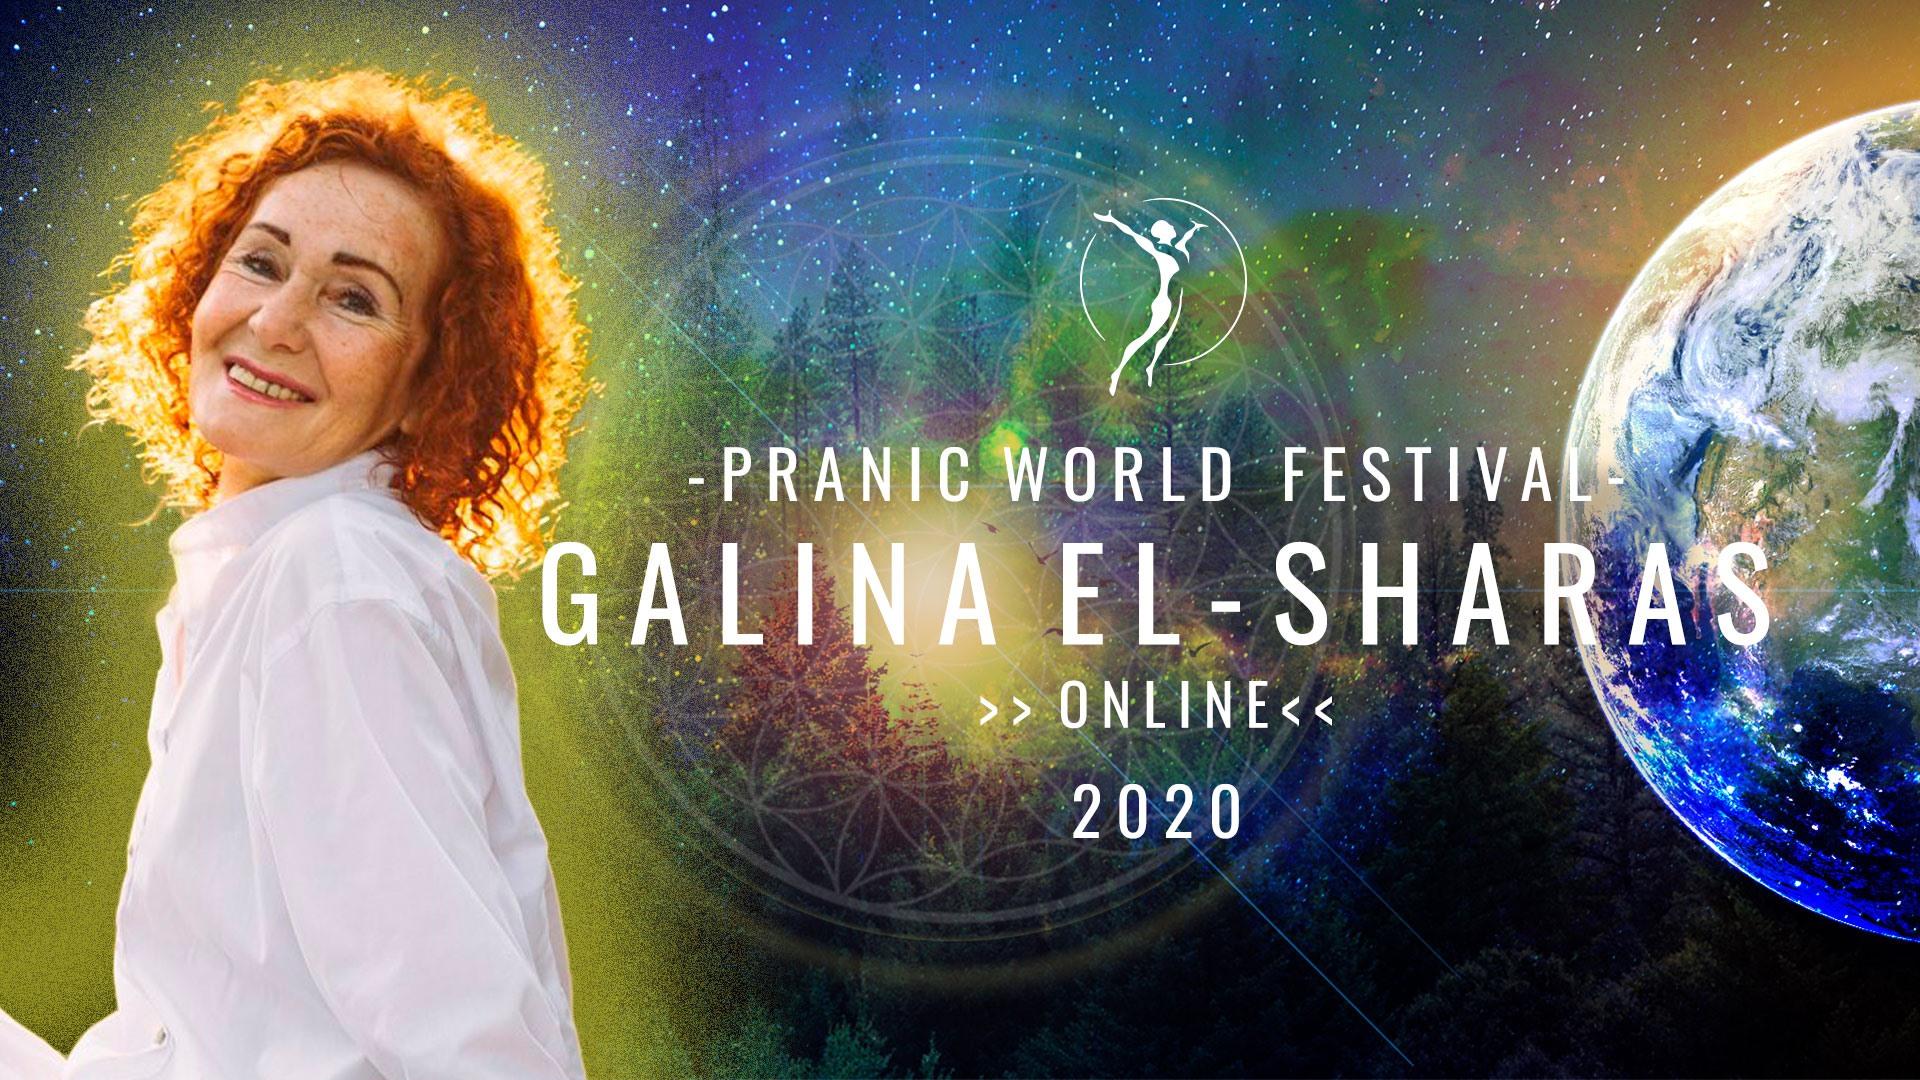 Galina El-Sharas